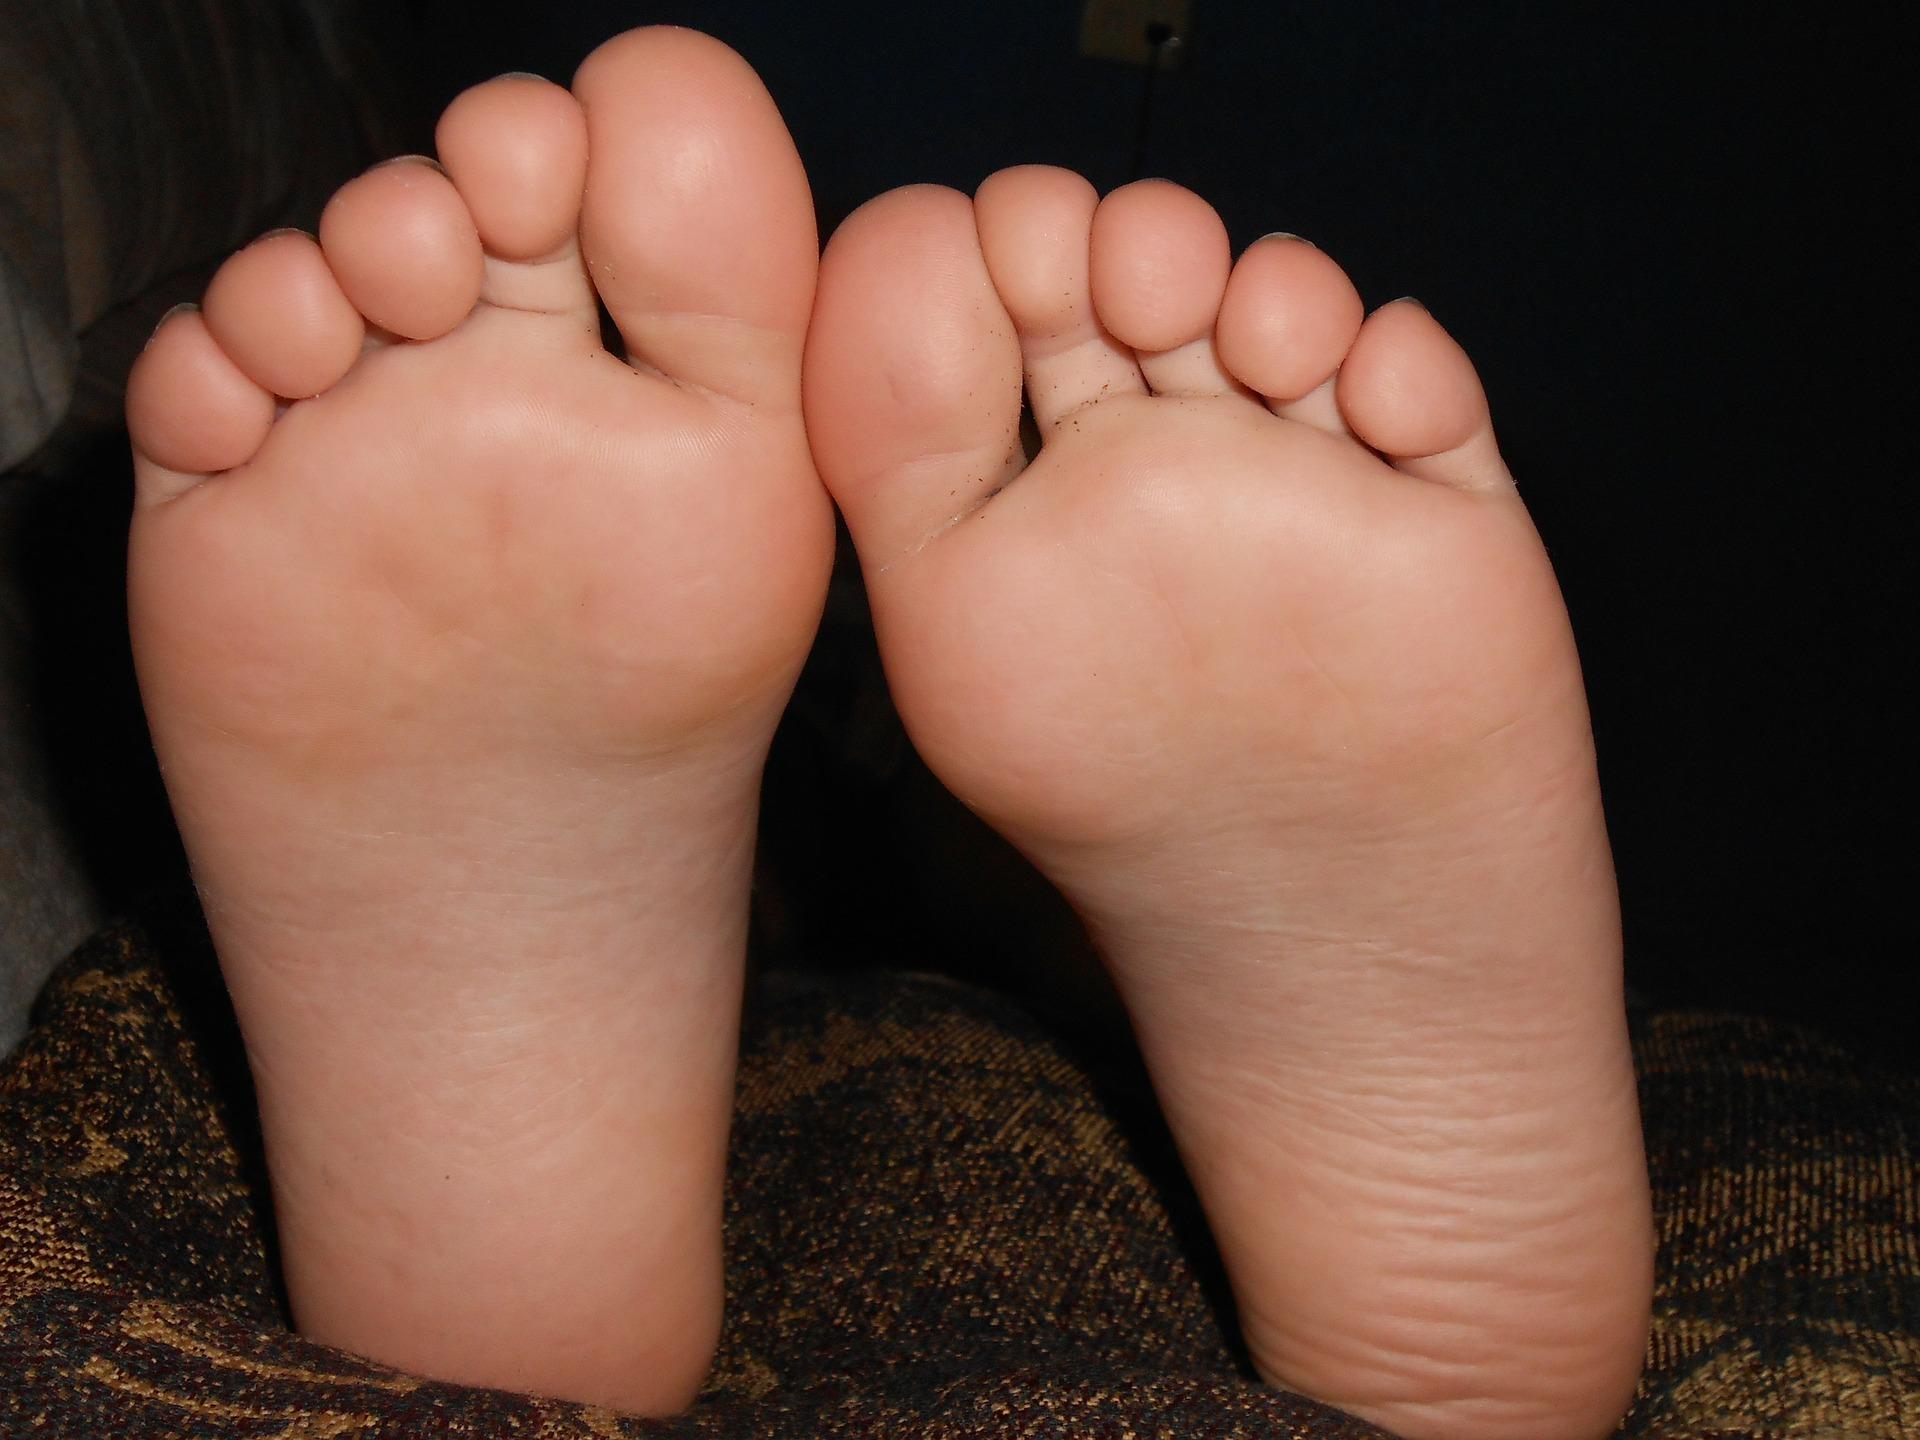 feet-179233_1920